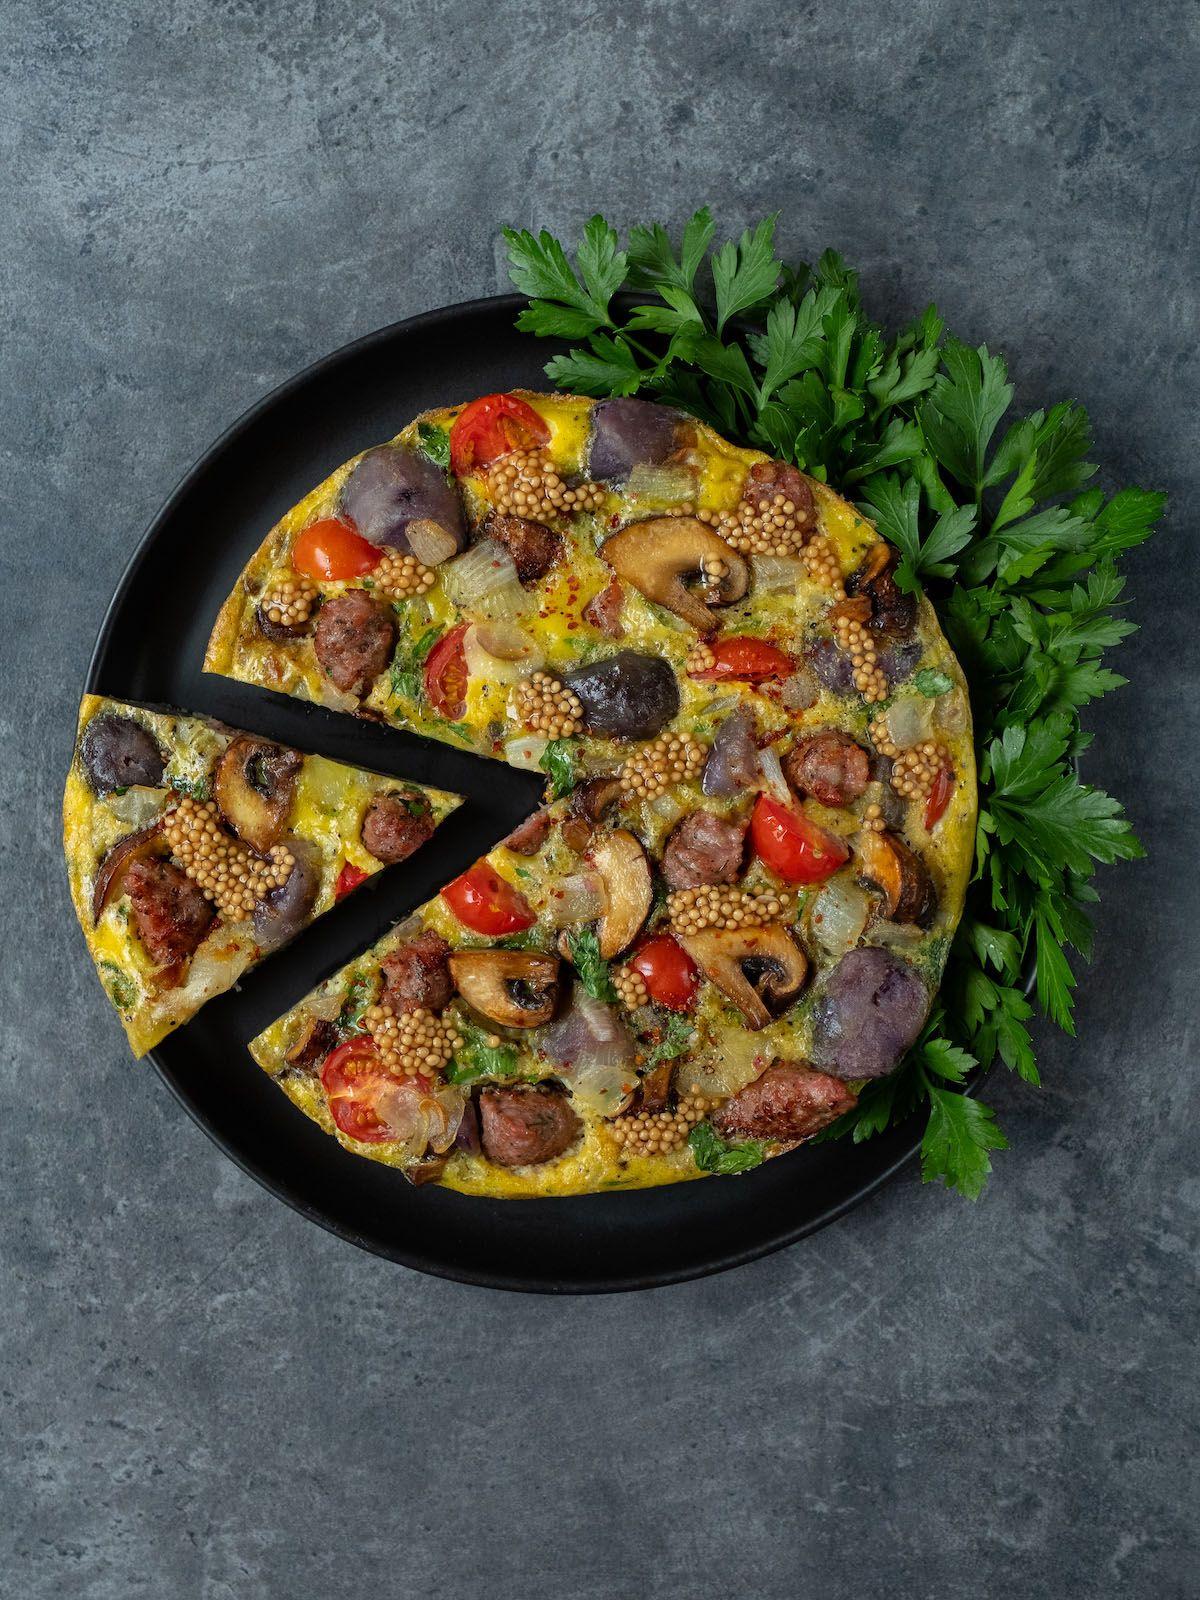 Rezept, Foodblog, Abput Fuel, Senfcaviar, Tortilla, Petersilie